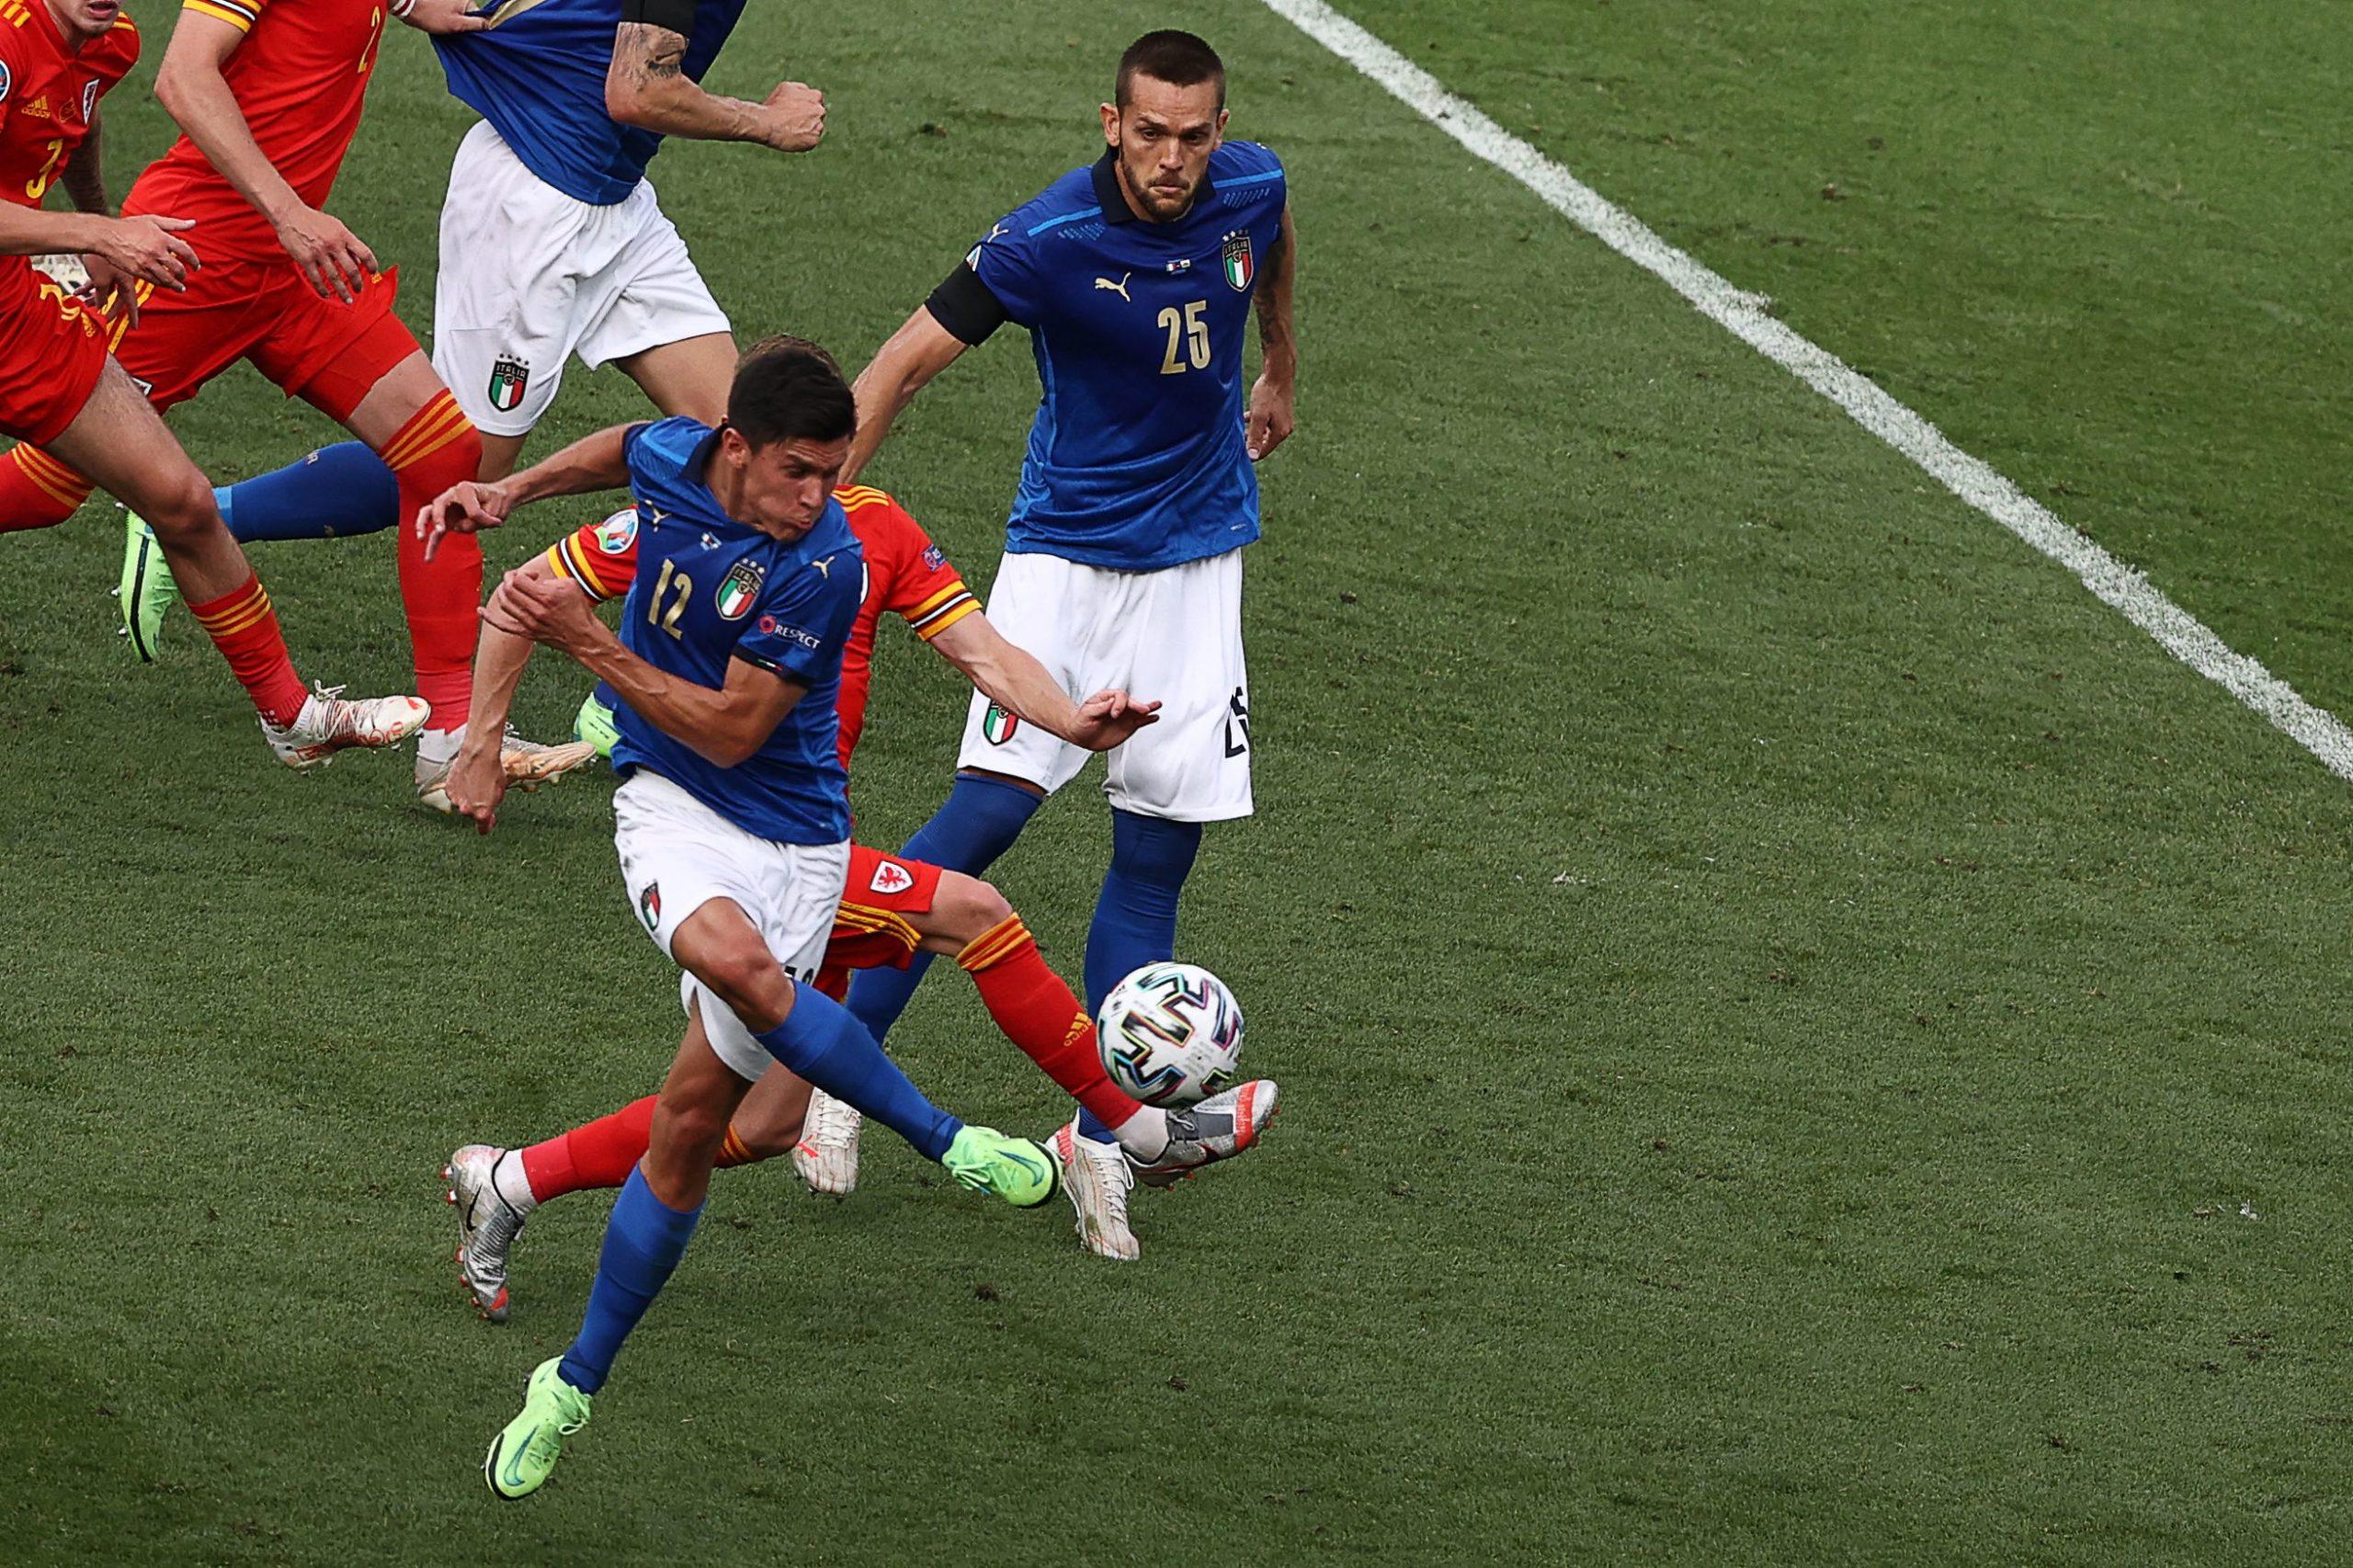 Europei, l'Italia 2 centra l'en plein